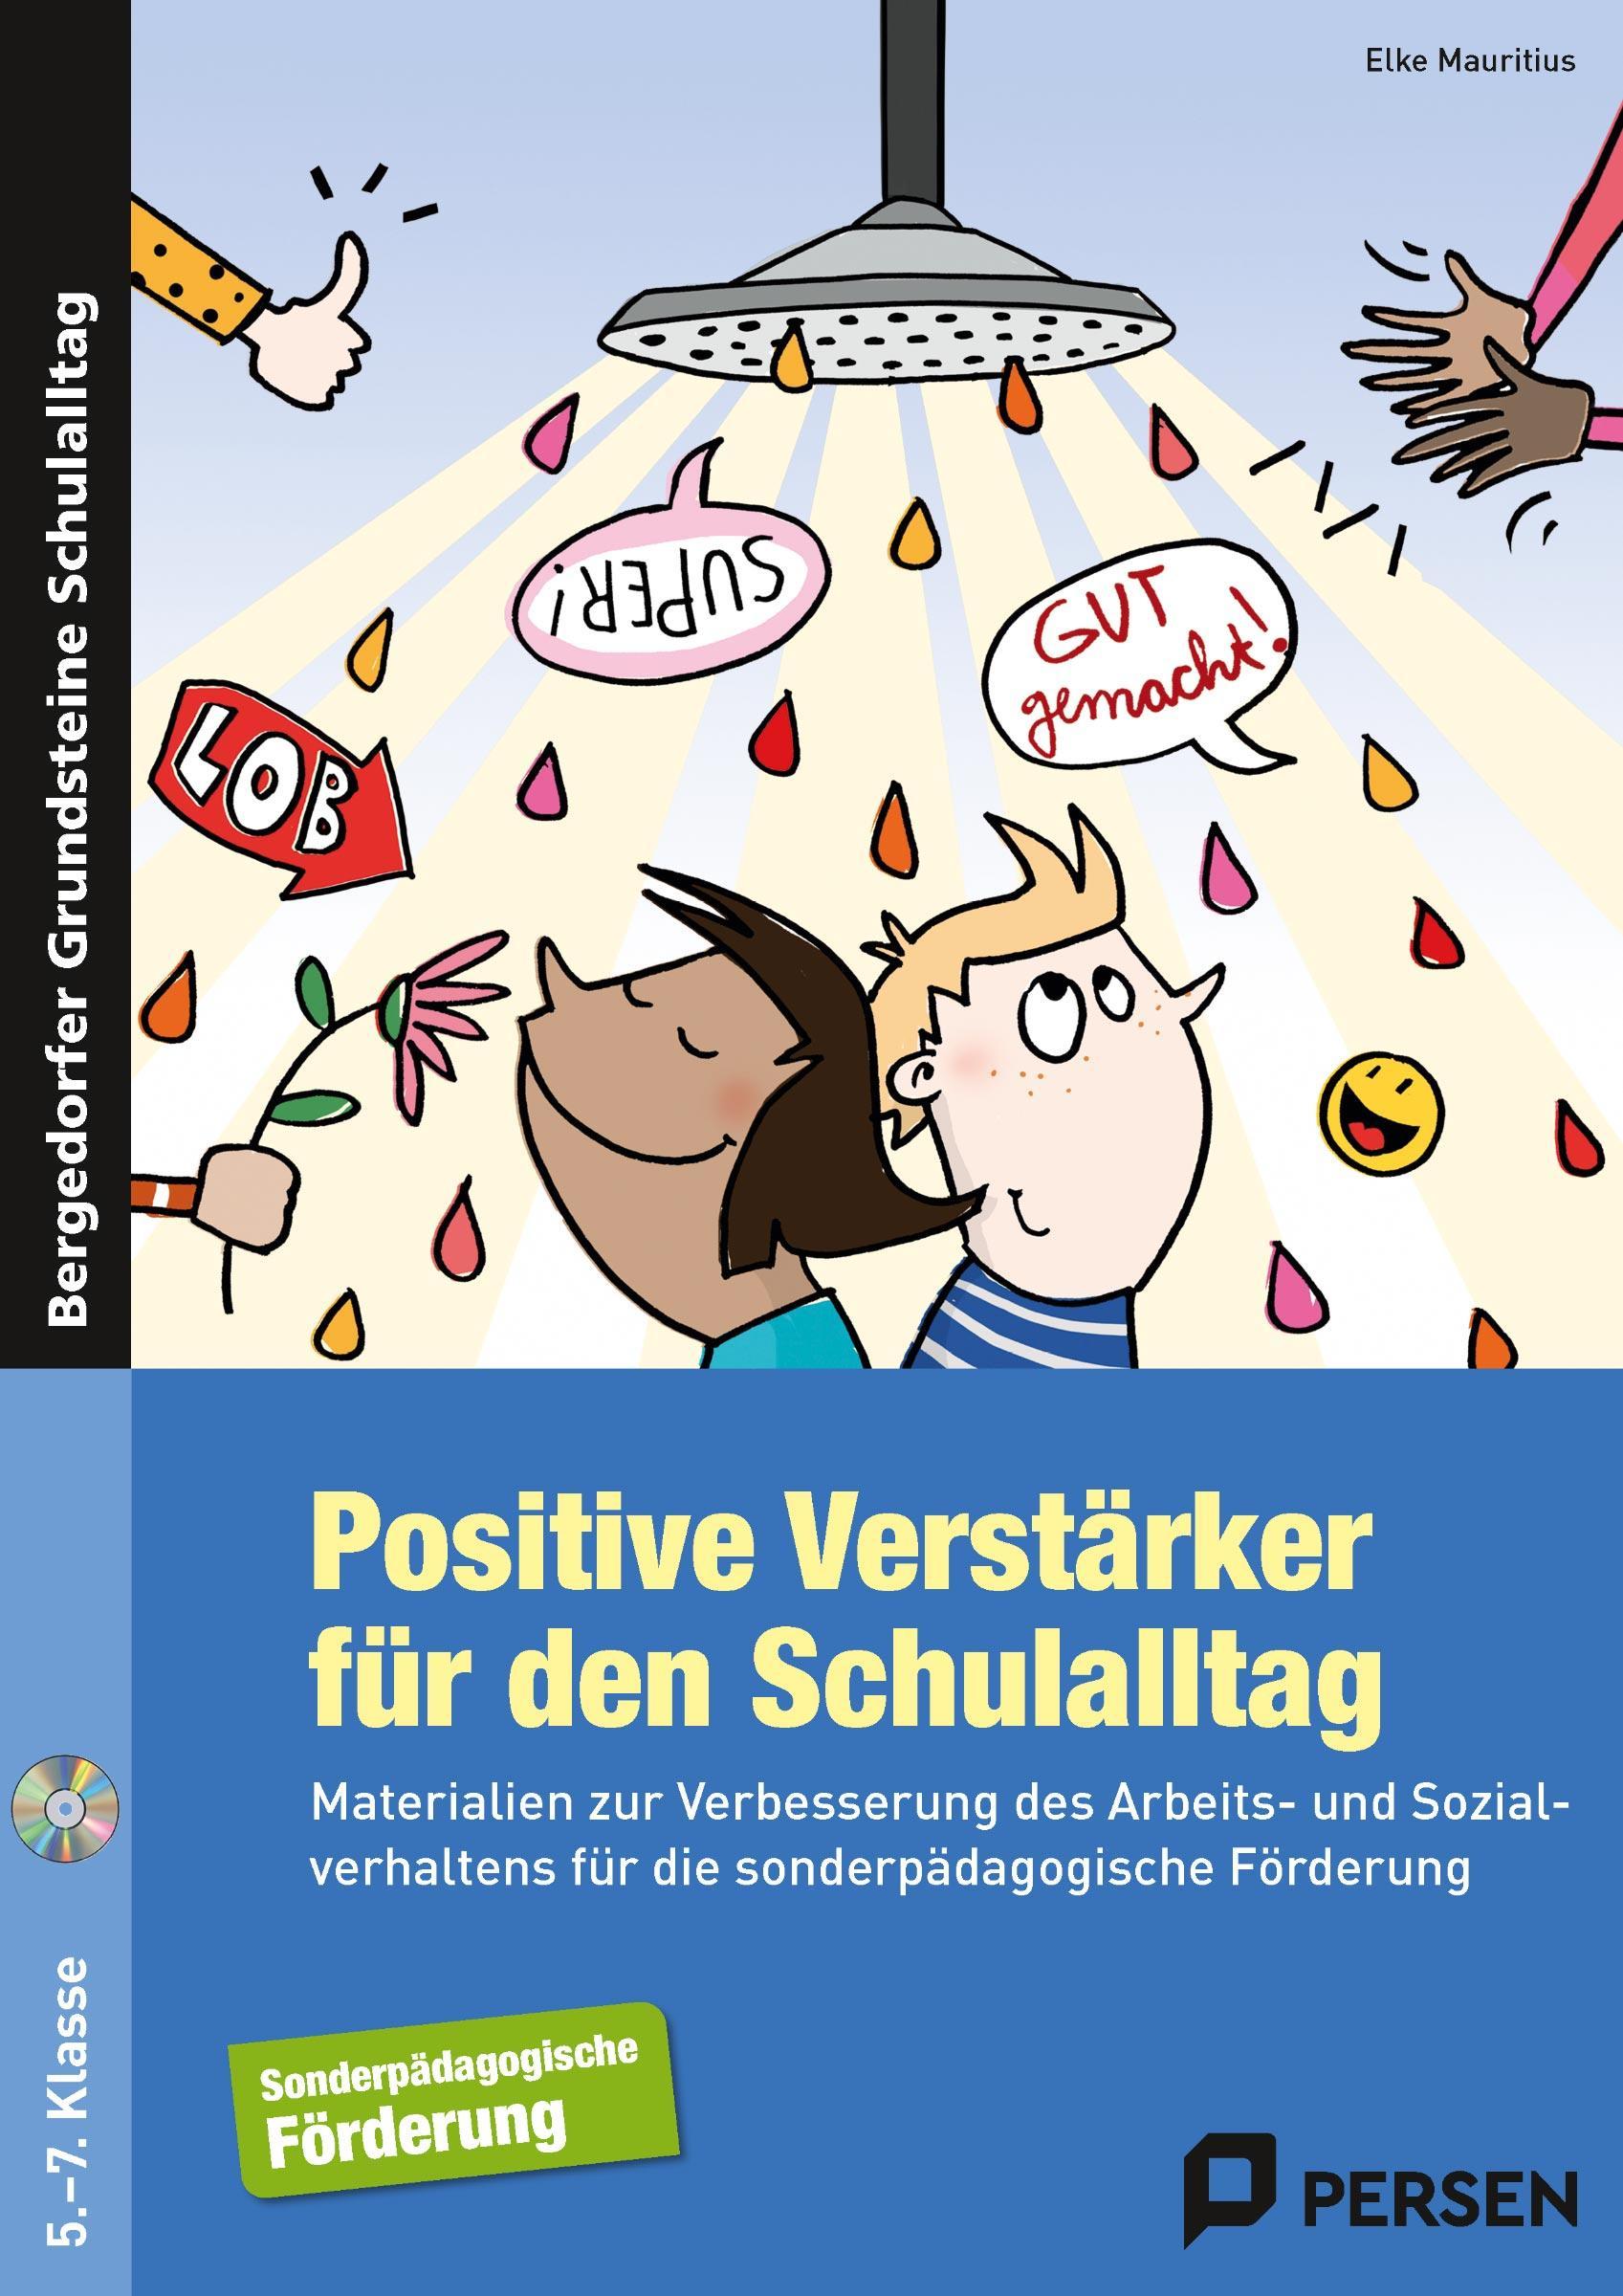 NEU Positive Verstärker für den Schulalltag Elke Mauritius 233831